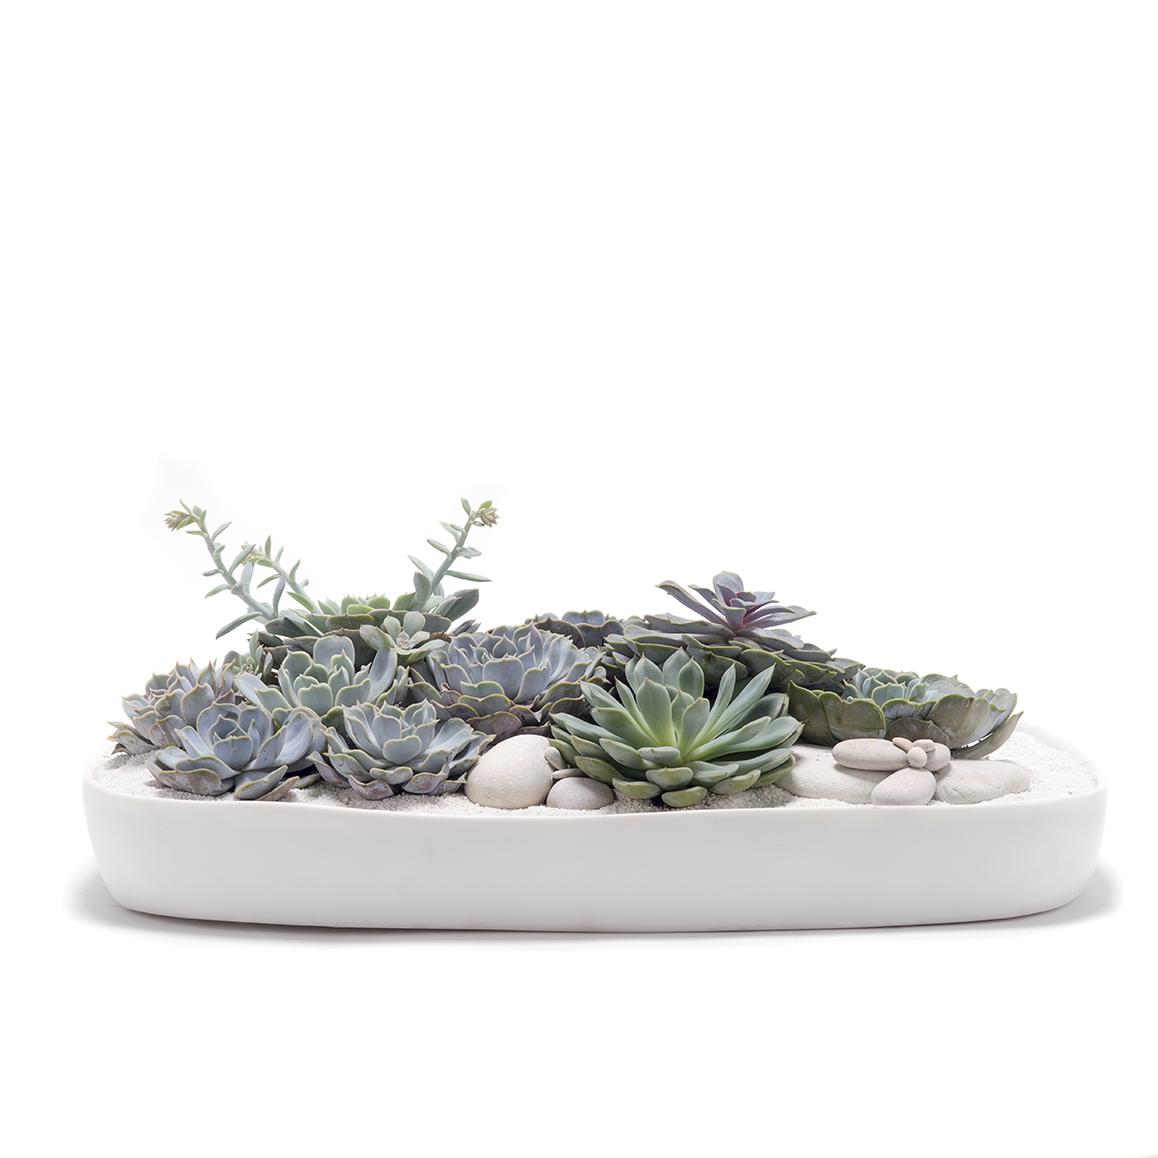 California Rectangle Large White - Echeveria Succulents